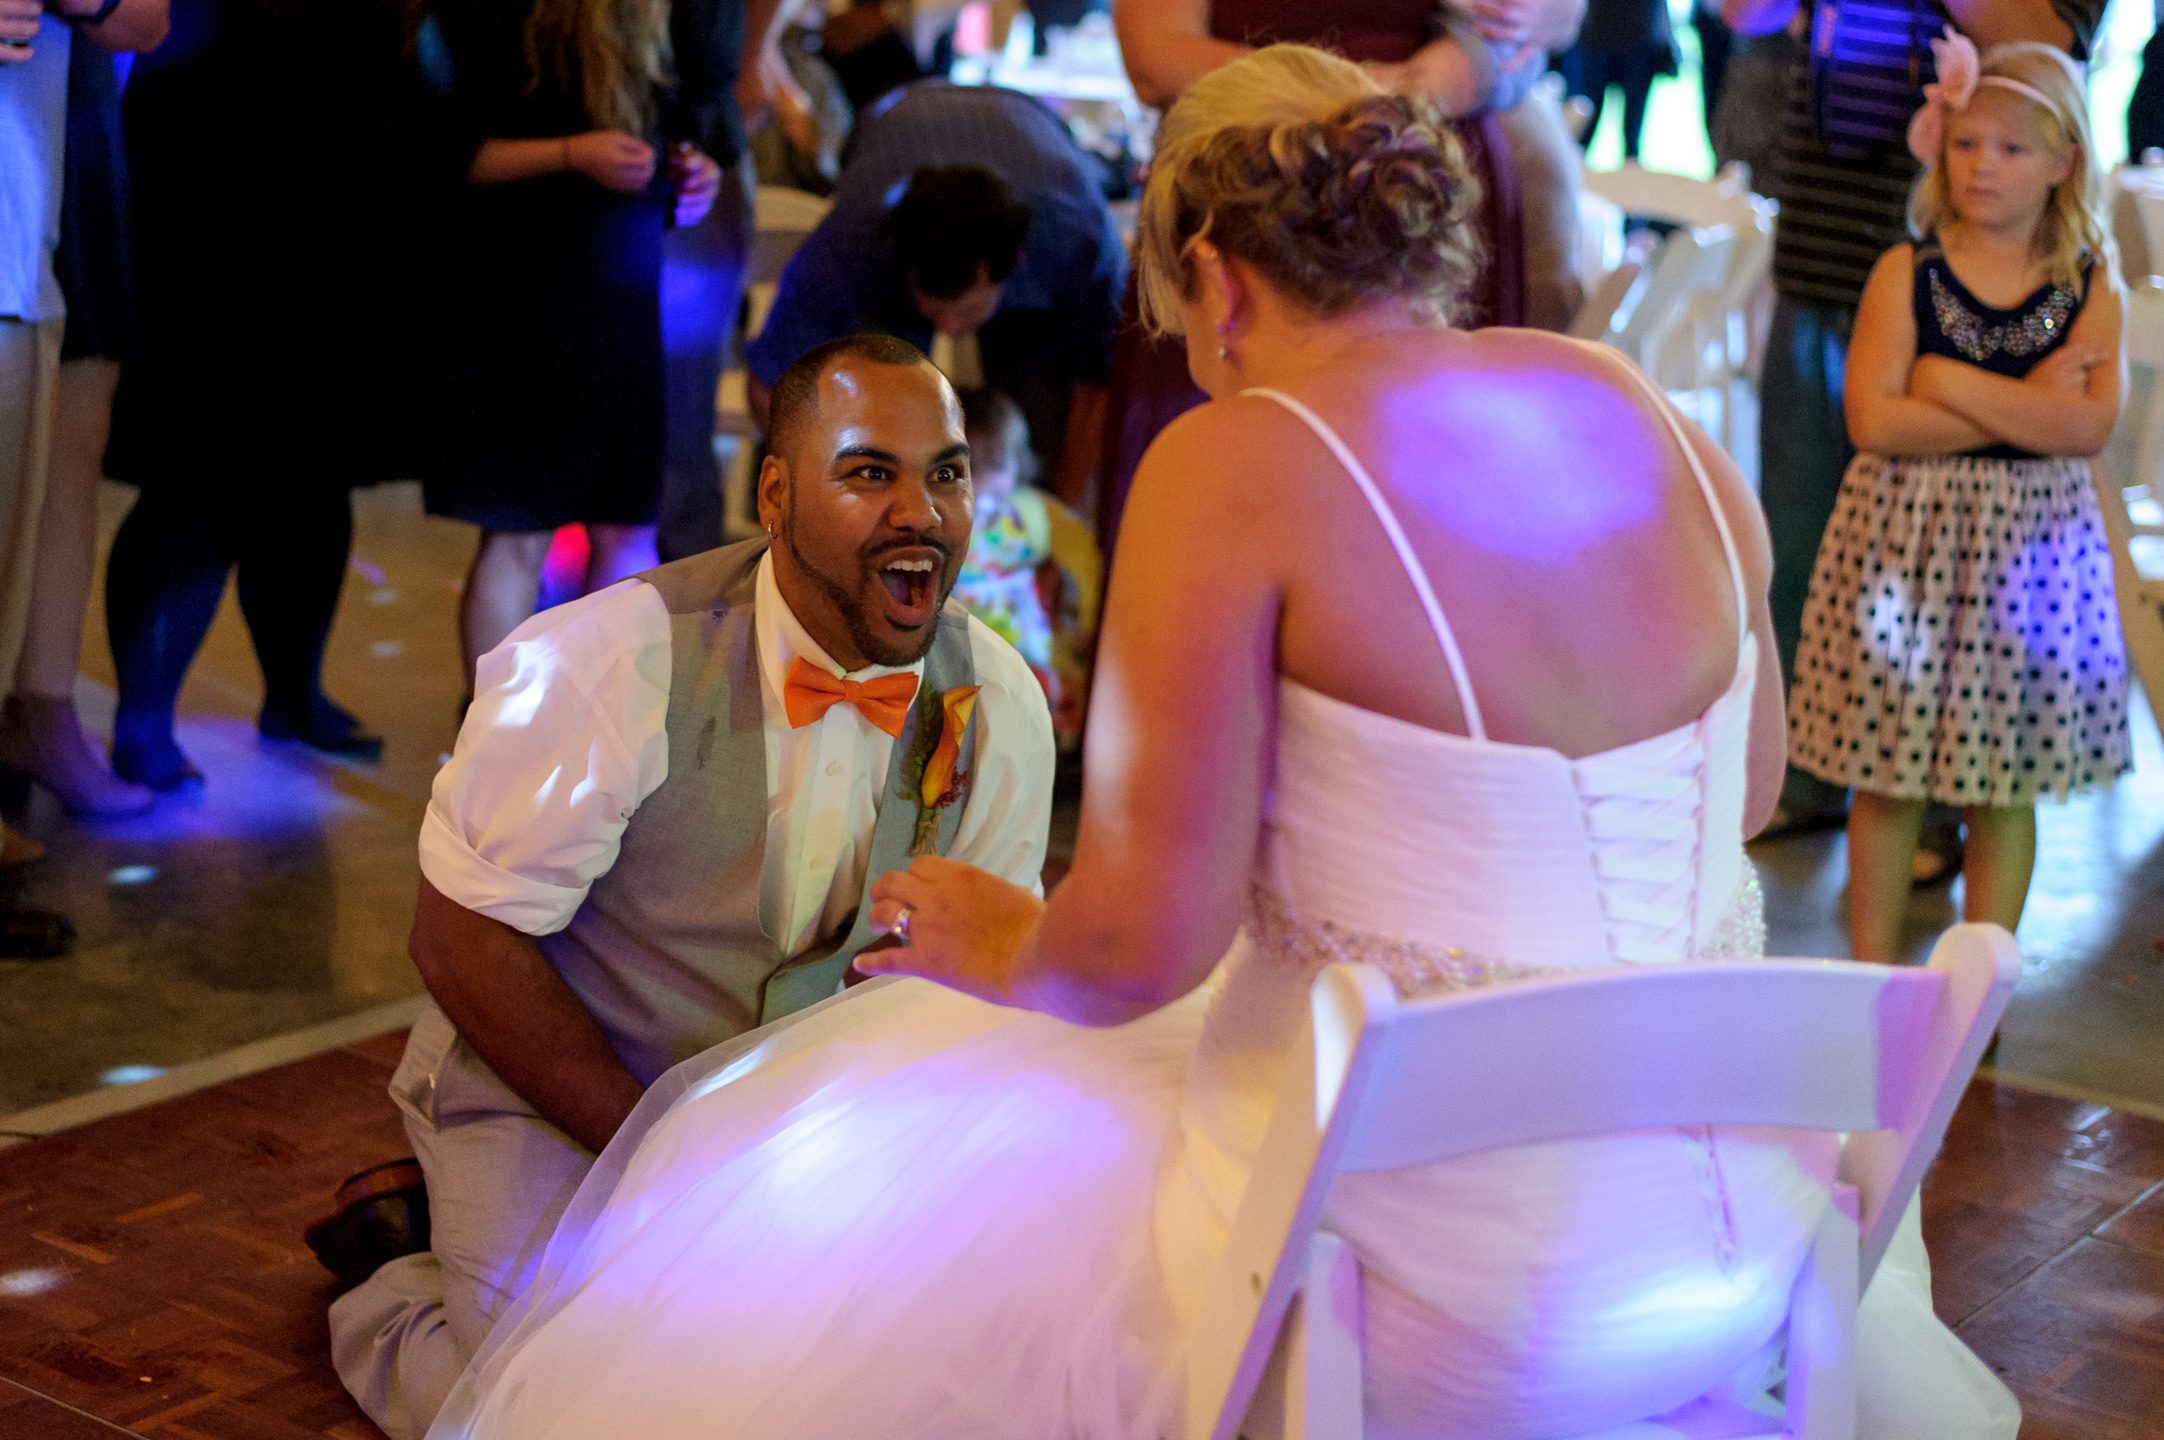 20160917_Tat_Renee and Marcus Wedding-98.jpg